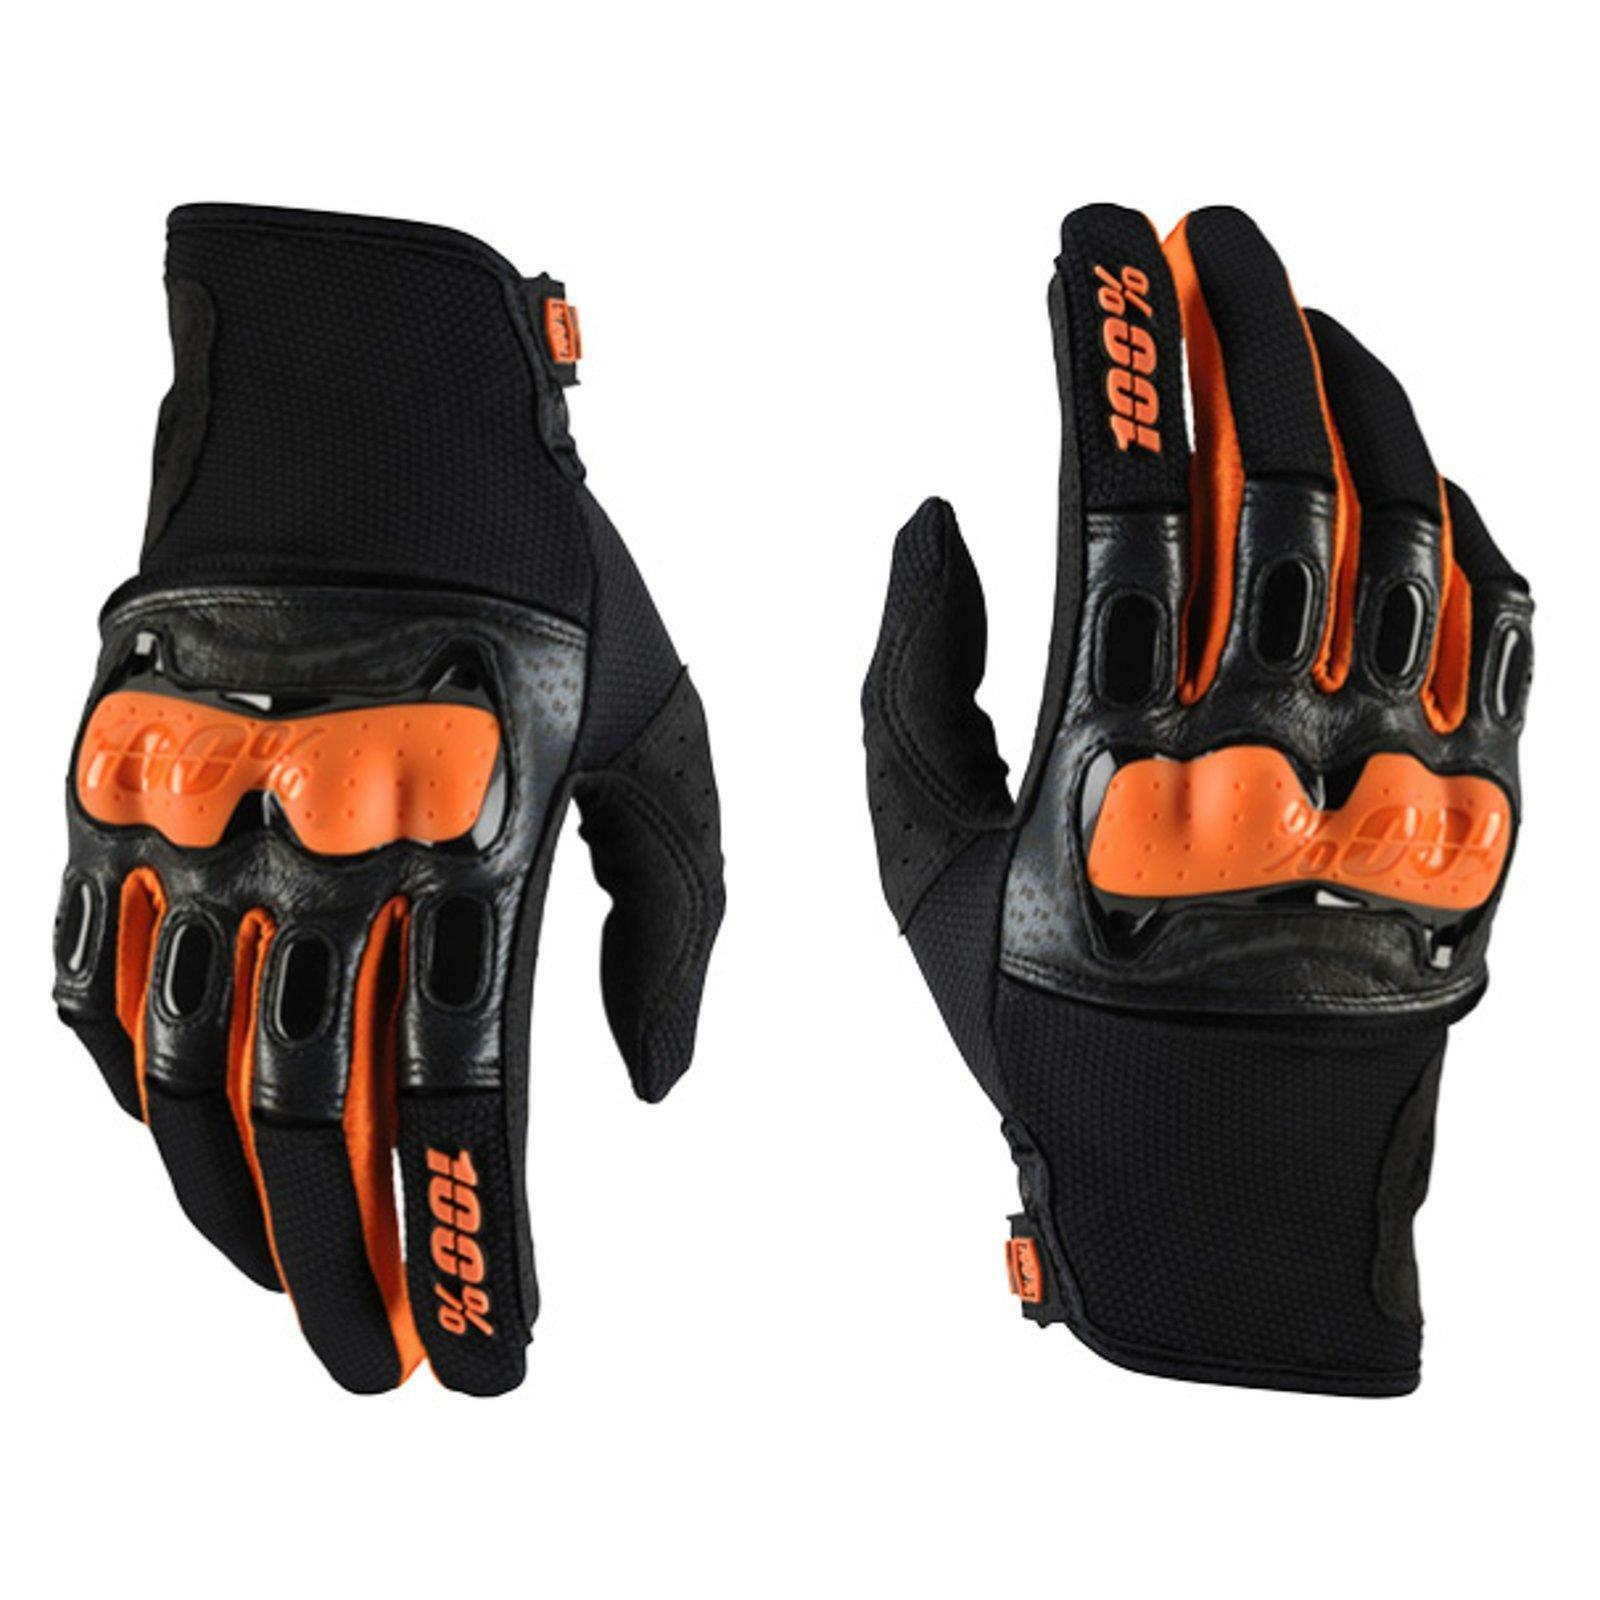 100% Prozent Derestricted Handschuhe MTB DH MX Motocross Enduro Offroad Quad